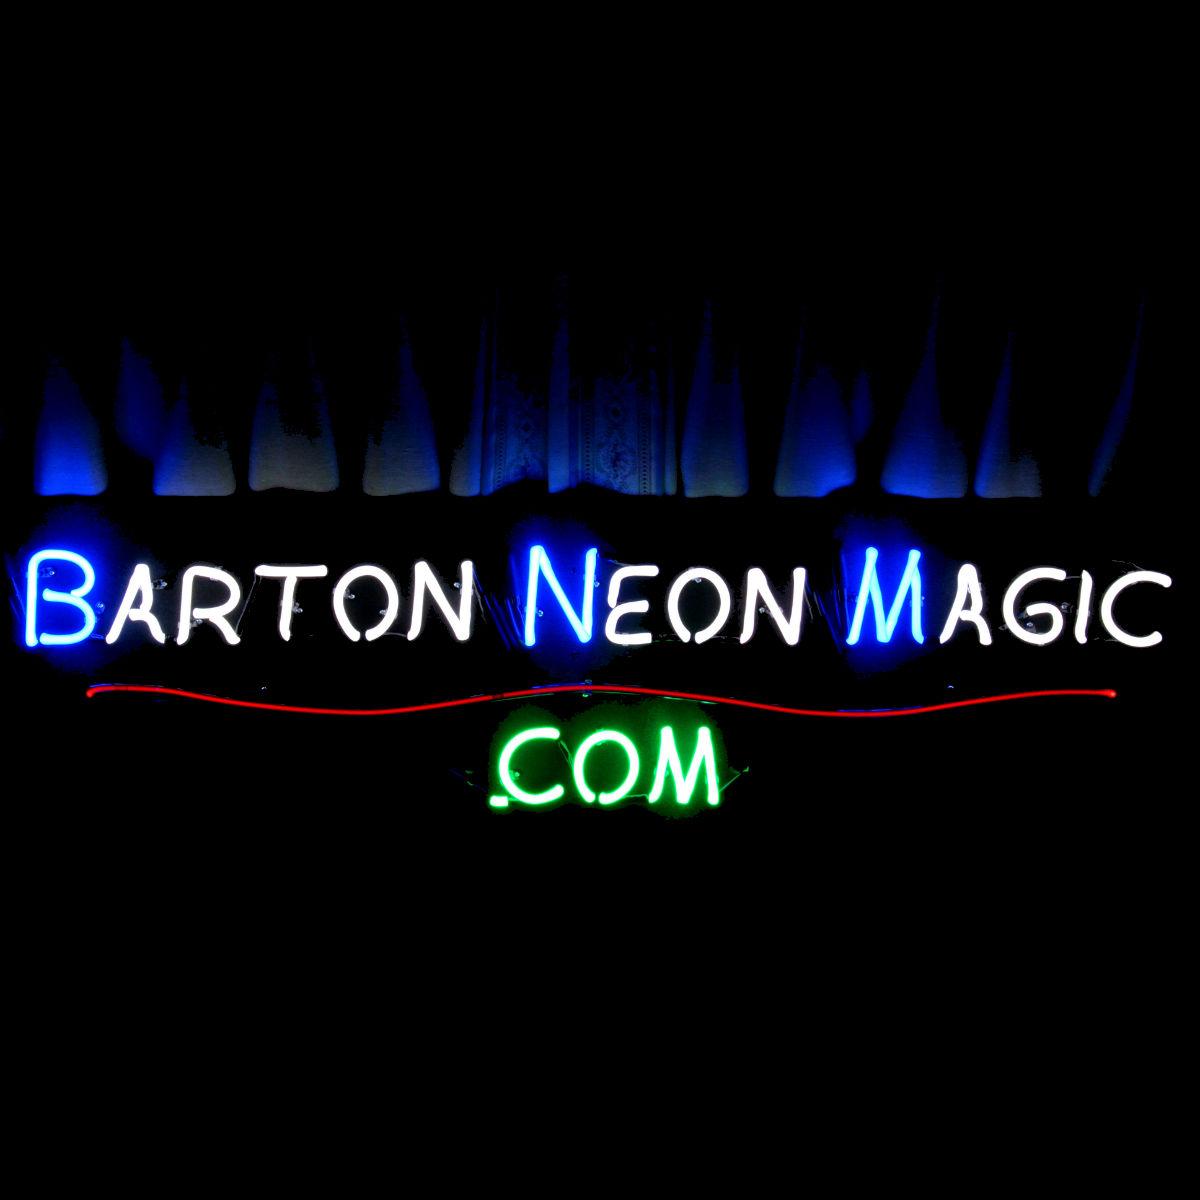 CUSTOM NEON SIGNS - BY JOHN BARTON - FAMOUS USA NEON GLASS ARTIST - BartonNeonMagic.com